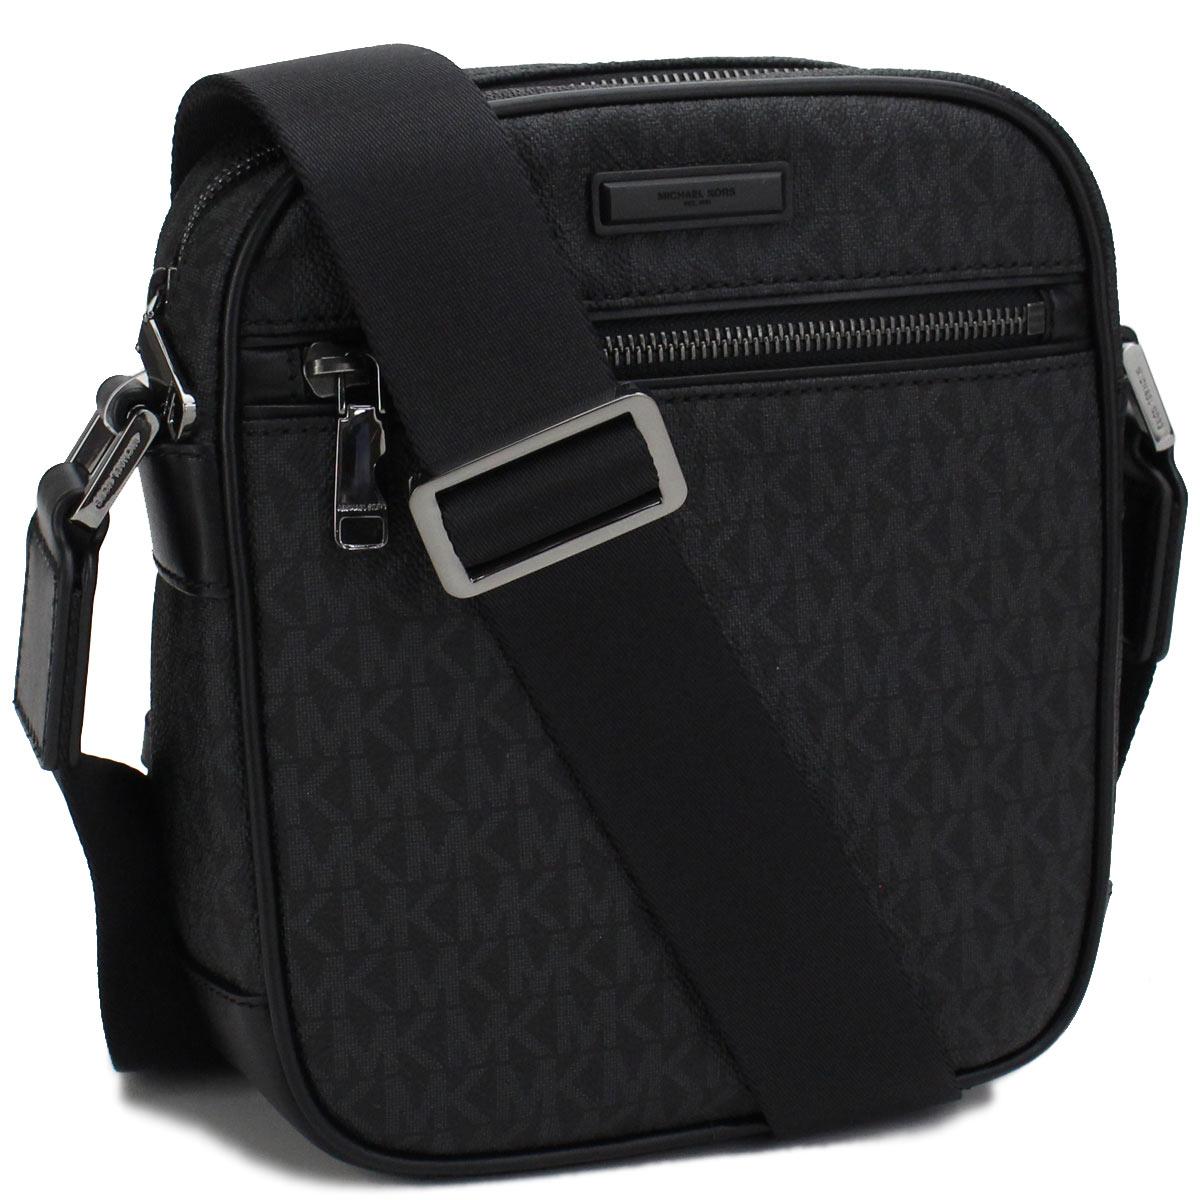 4b49e929dcf203 Bighit The total brand wholesale: Take Michael Kors (MICHAEL KORS) JET SET  MENS slant; shoulder bag 33F7MMNC5B BLACK black | Rakuten Global Market